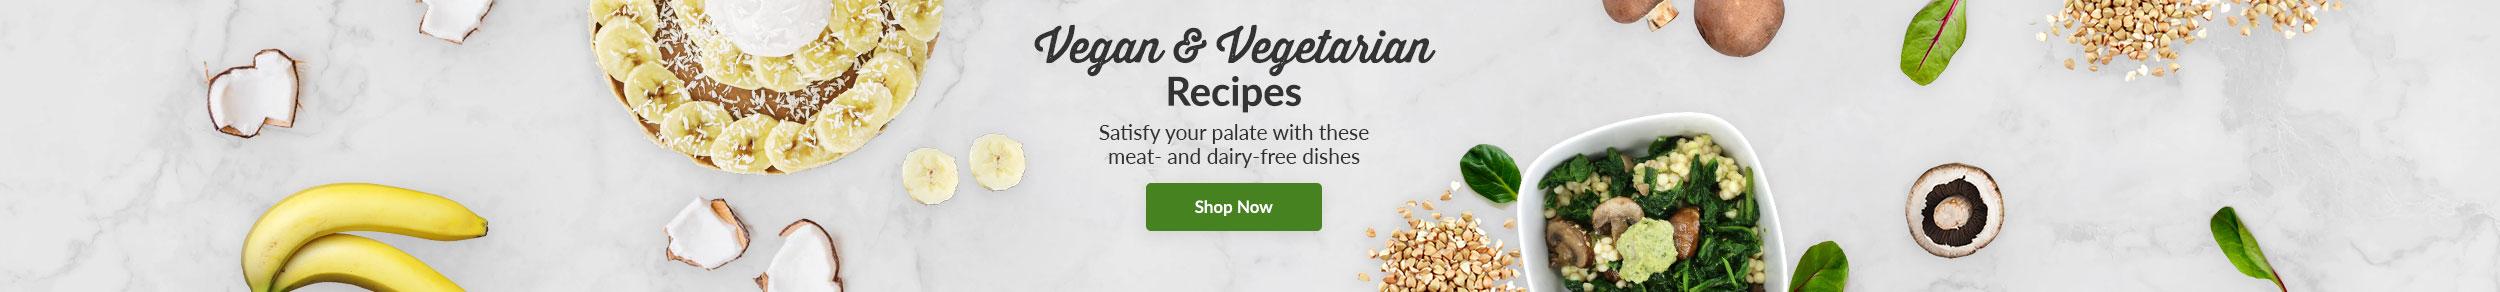 https://i3.pureformulas.net/images/static/Vegan-and-Vegetarian-Recipes_122818.jpg